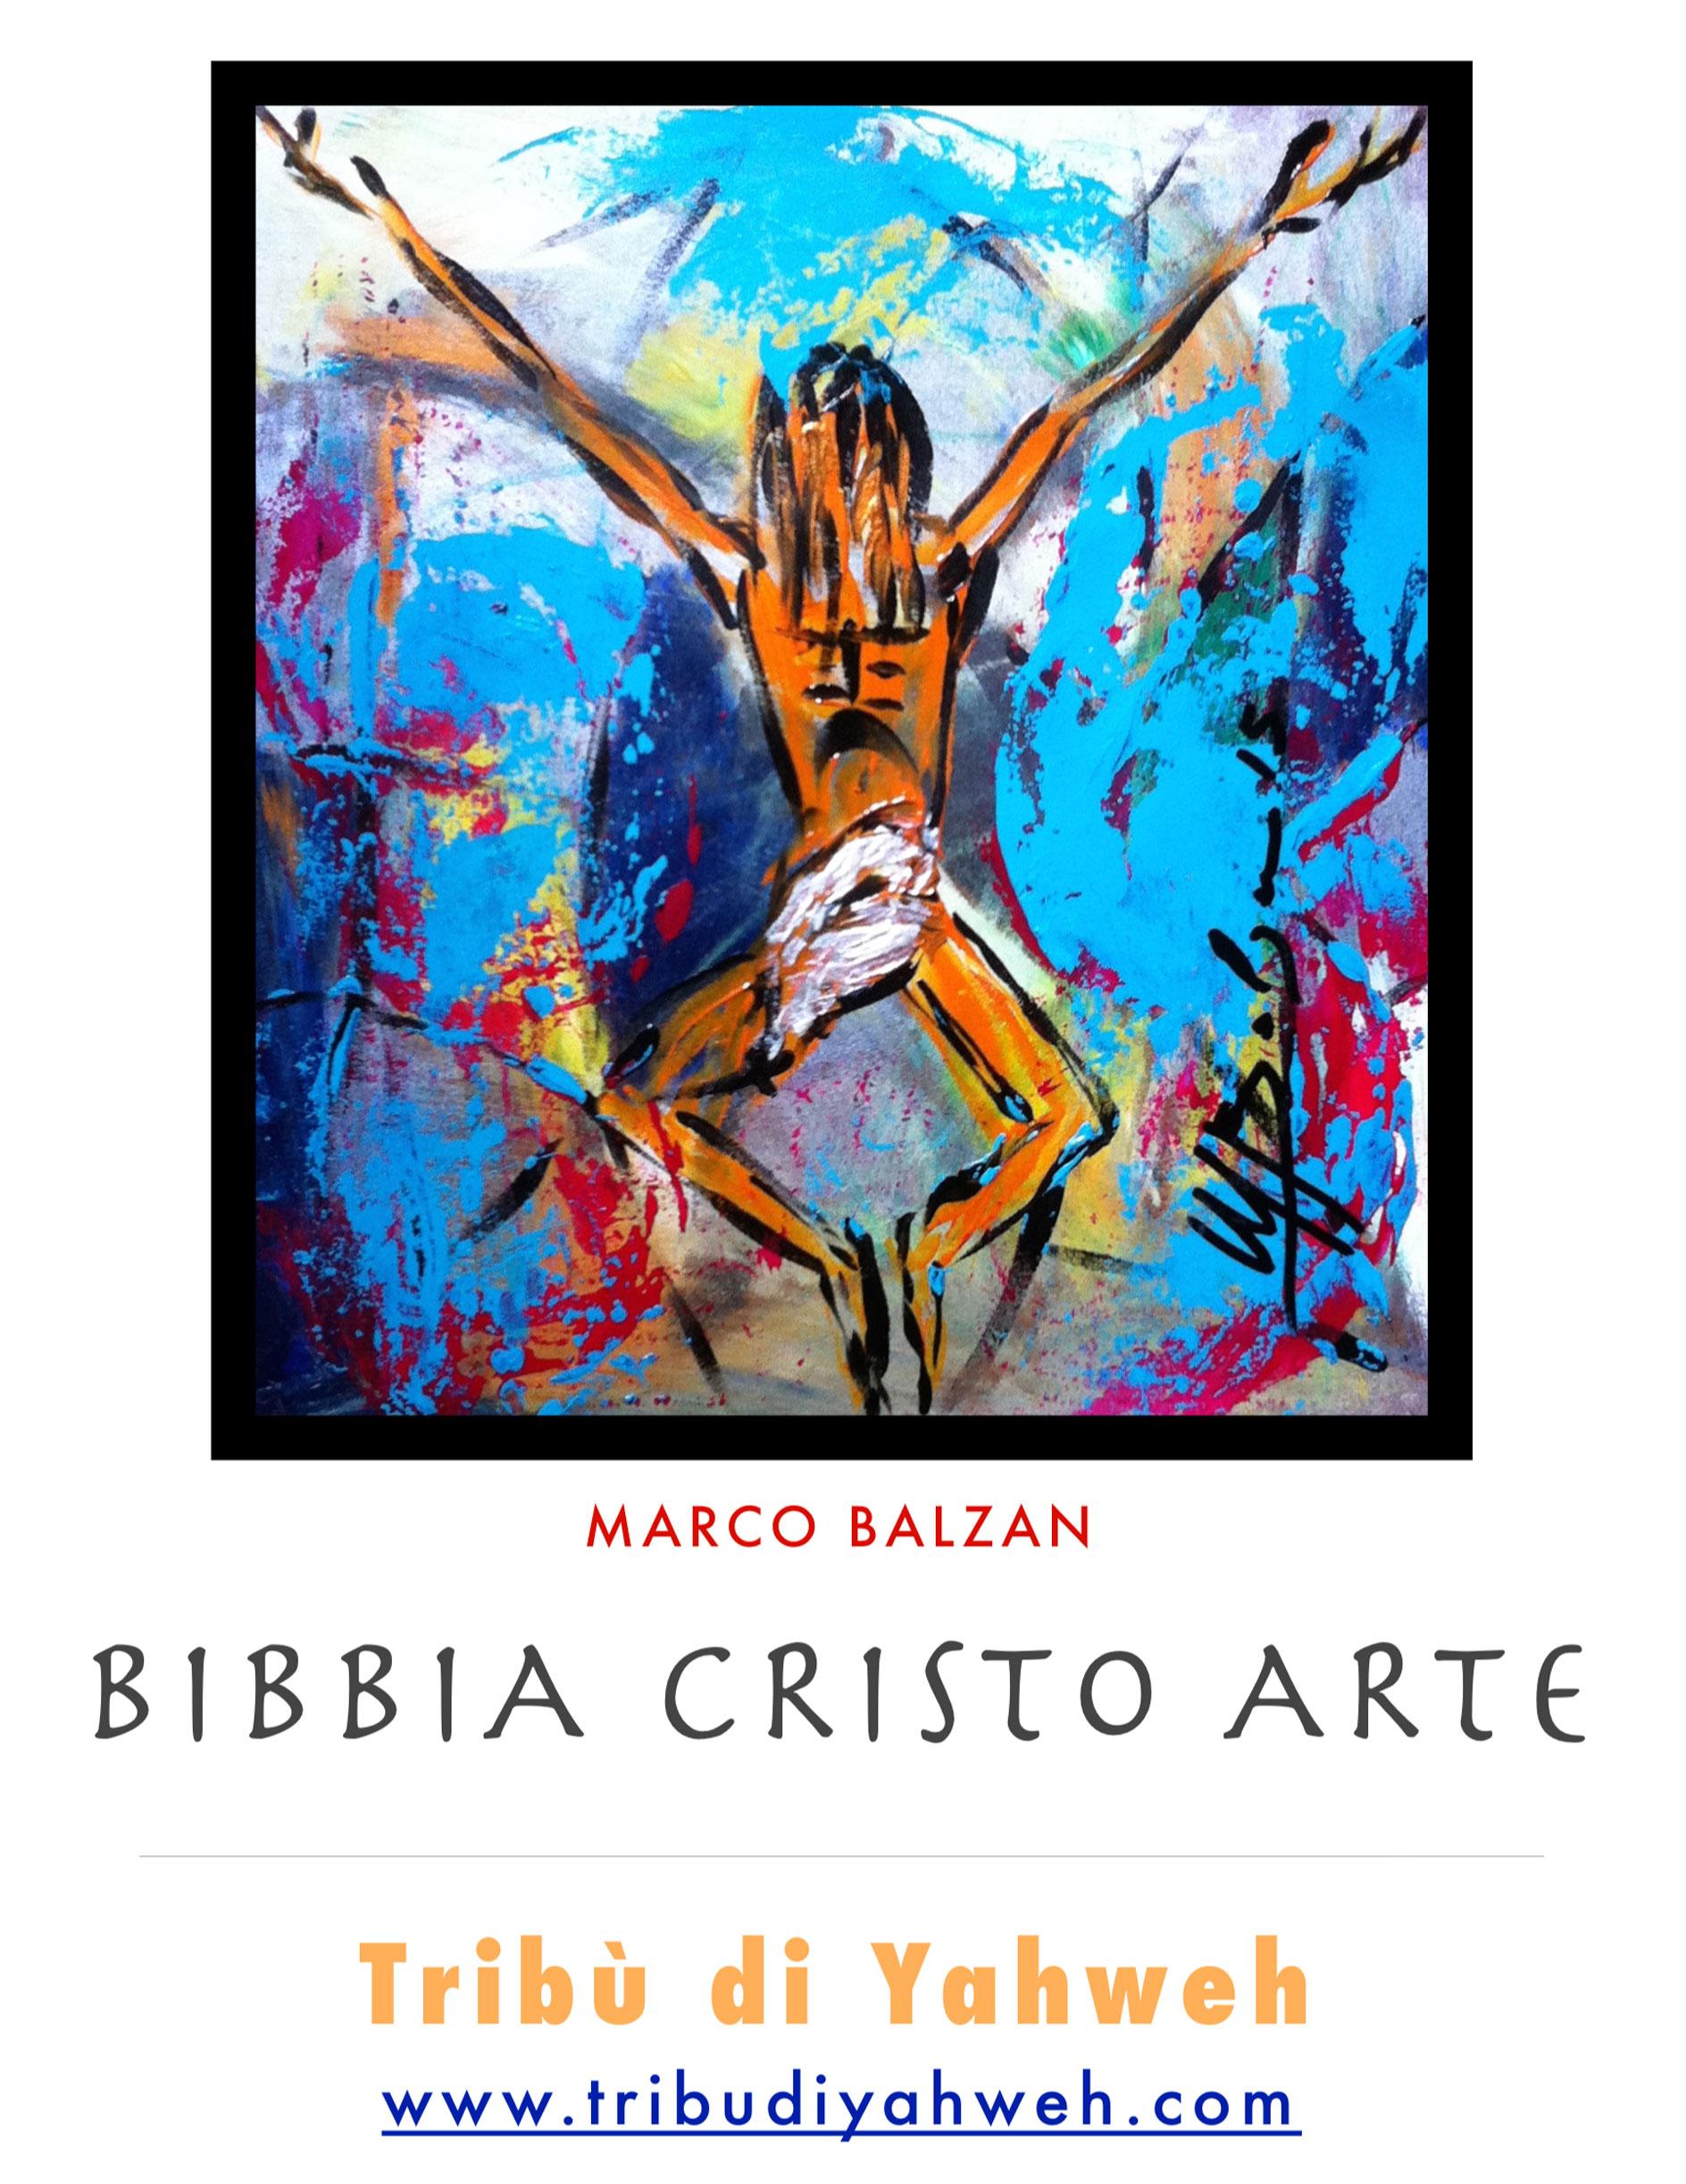 http://www.tribudiyahweh.com/wp/wp-content/uploads/2019/03/bibbia-cristo-arte.jpg